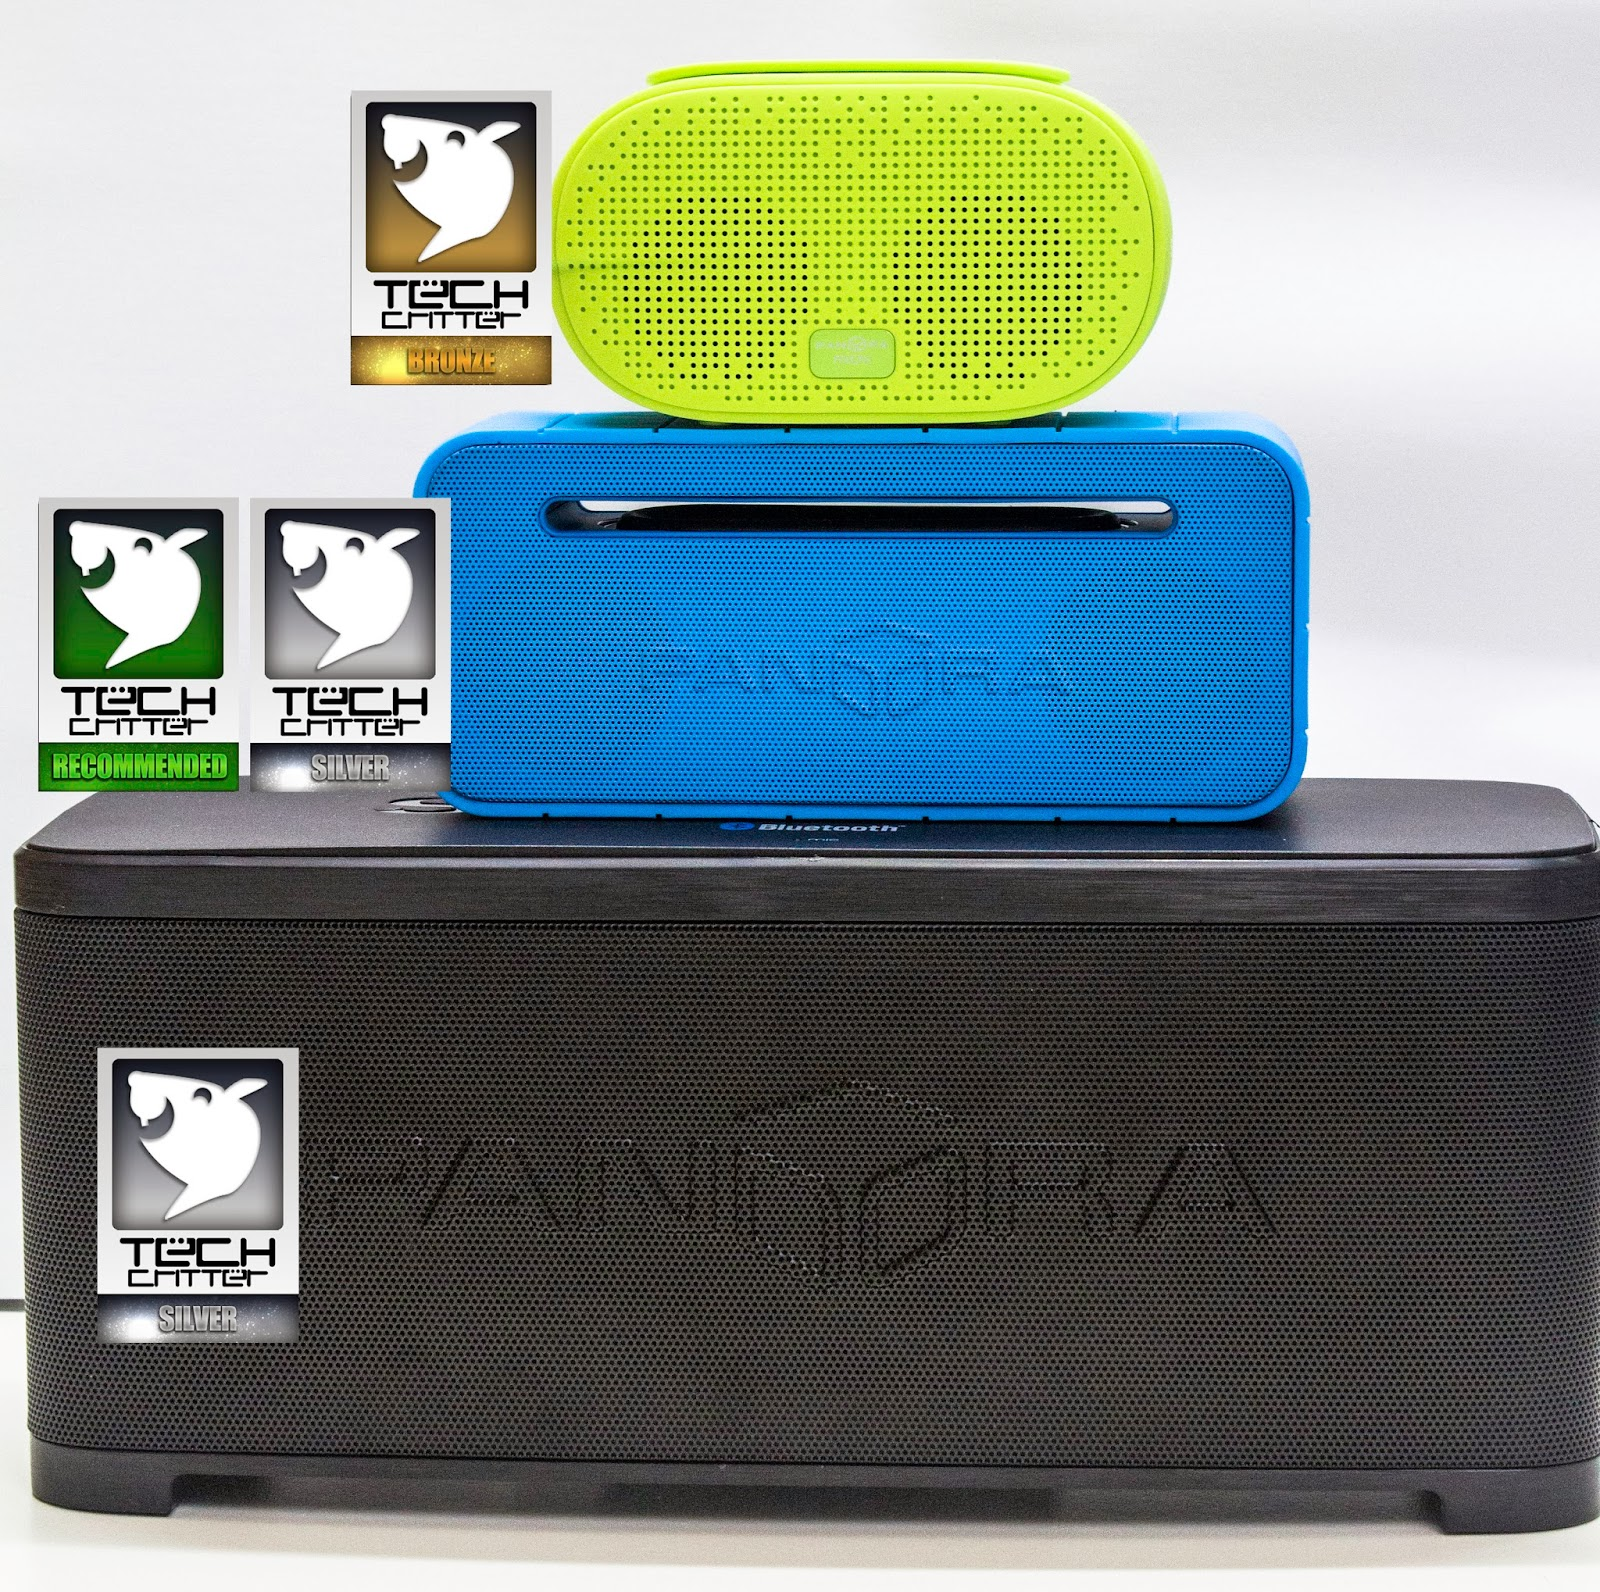 Opening Pandora's Box: SonicGear Pandora Wireless Bluetooth Media Player Series 31